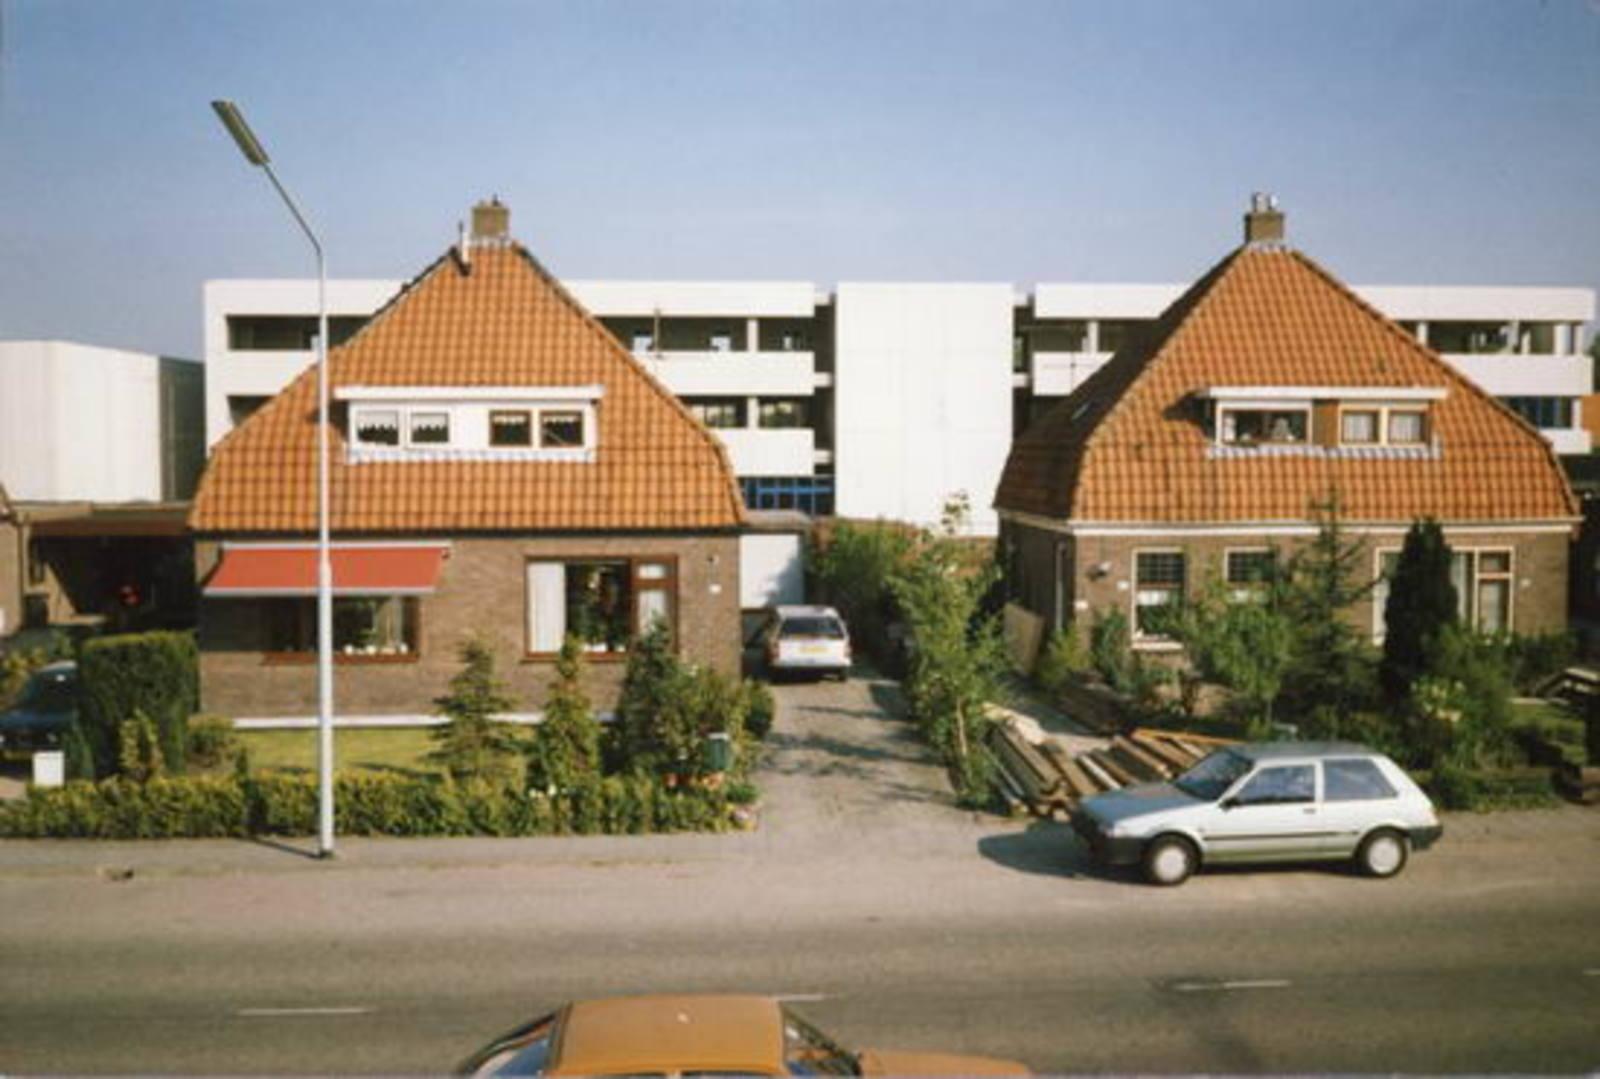 Rijnlanderweg O 0798-804 19__ Huize 01